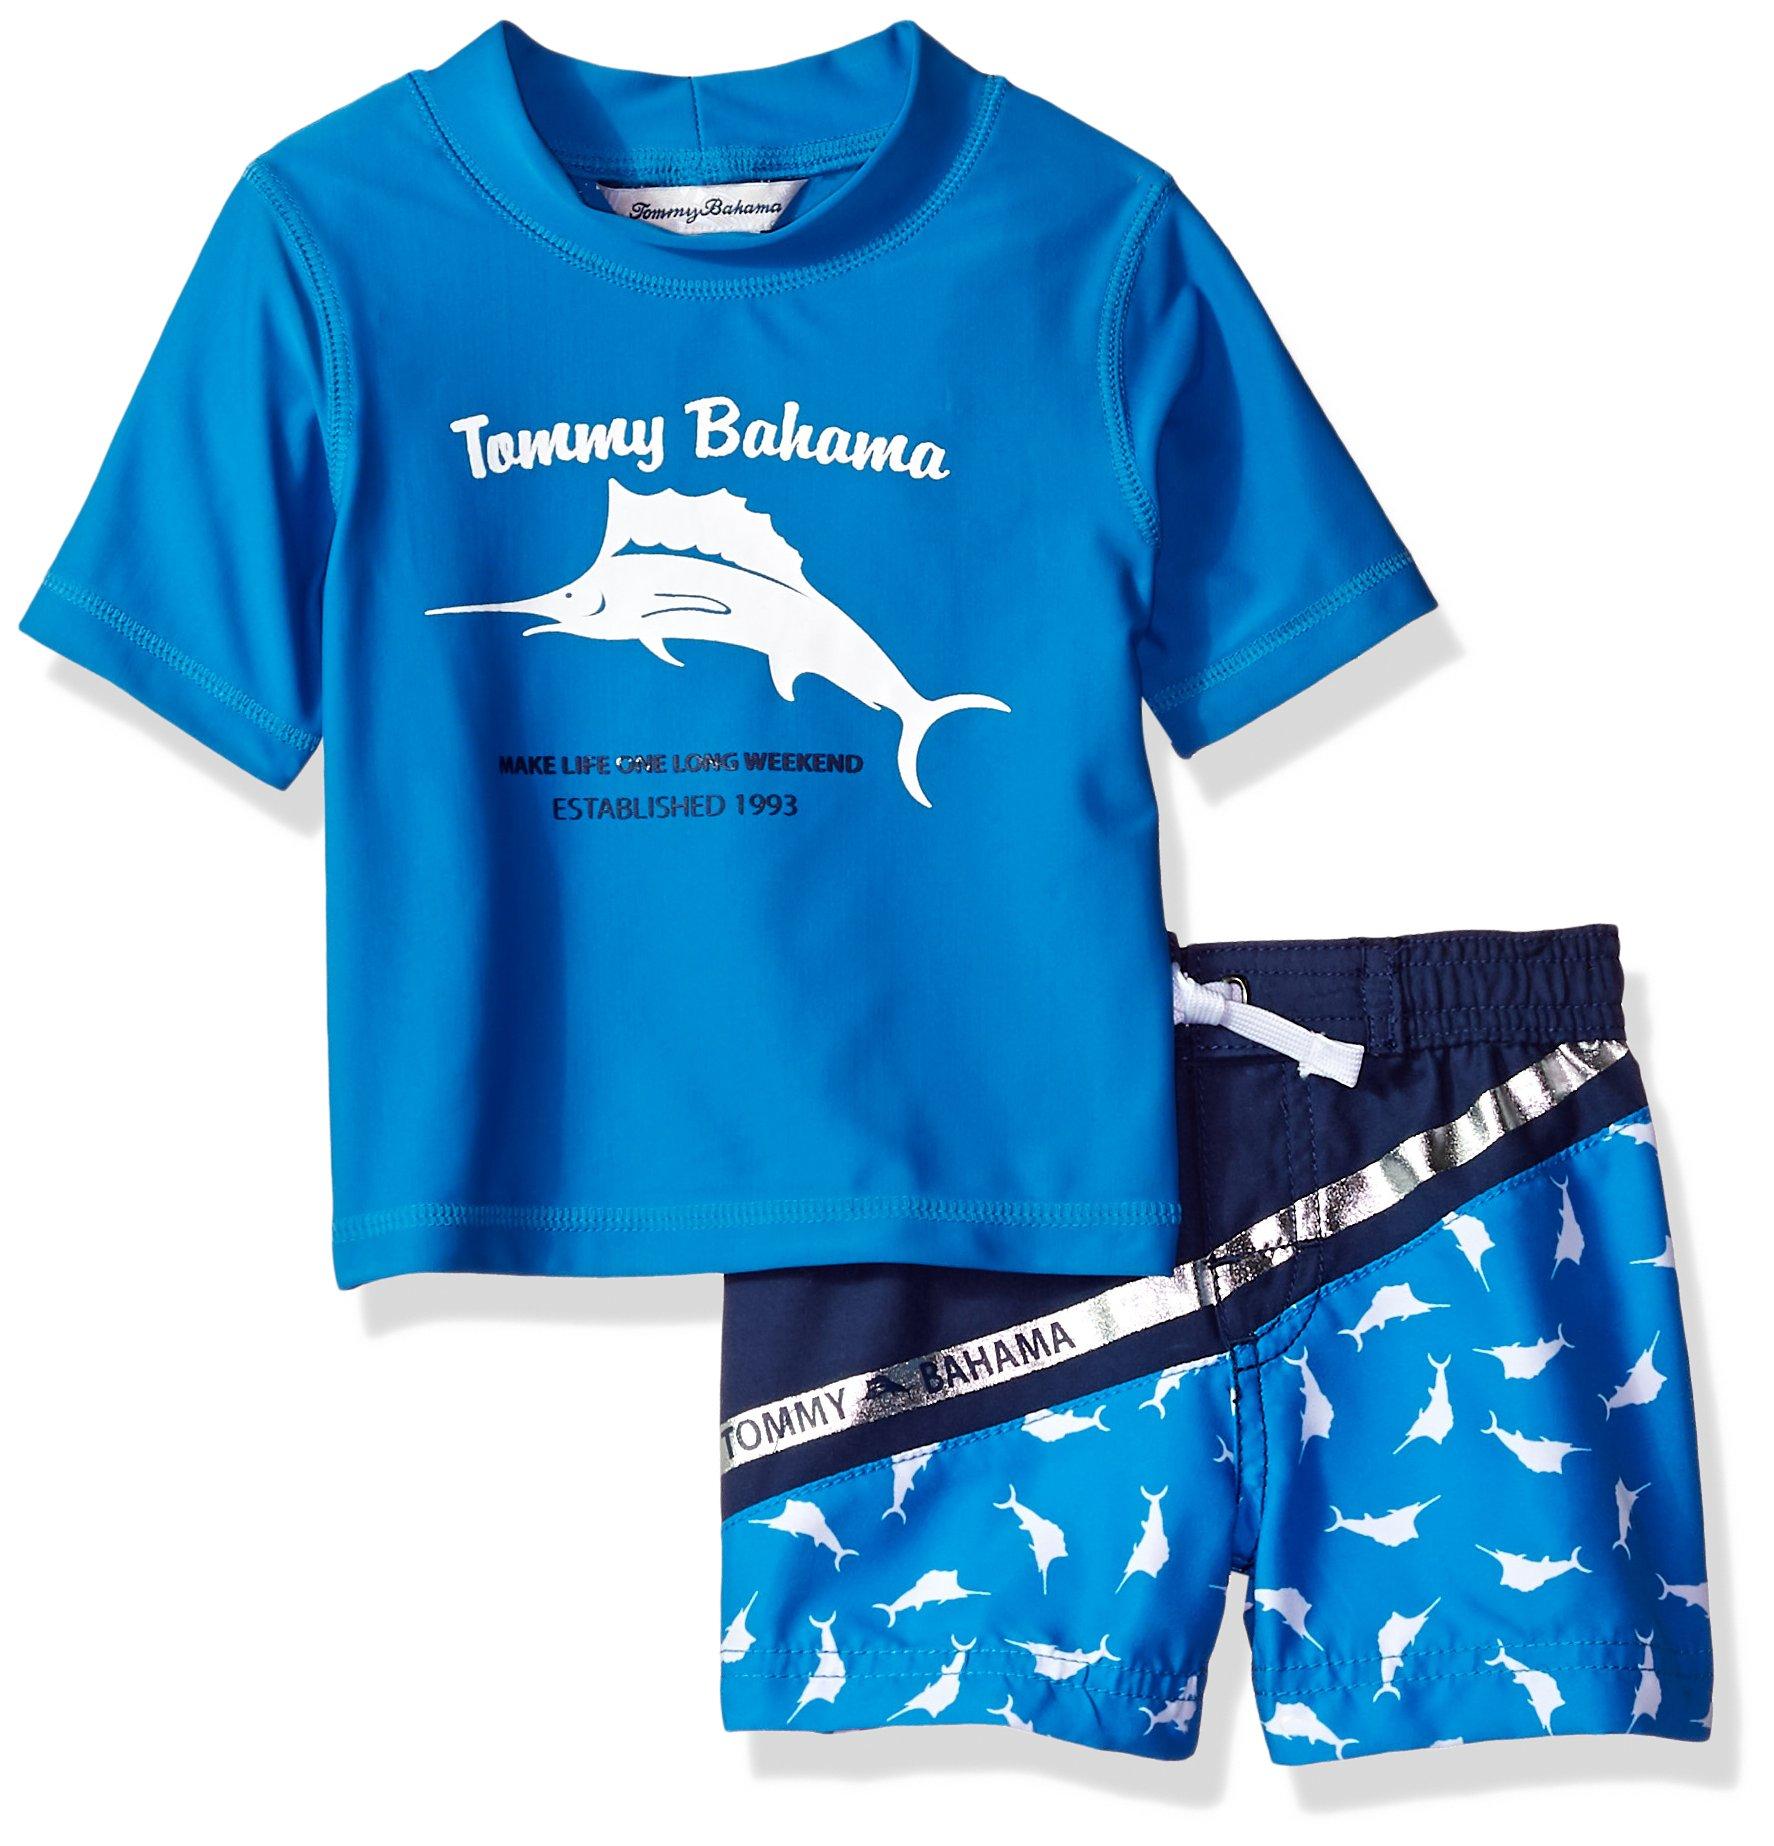 Tommy Bahama Boys' Baby Rashguard and Trunks Swimsuit Set, Marlin Blue, 4T by Tommy Bahama